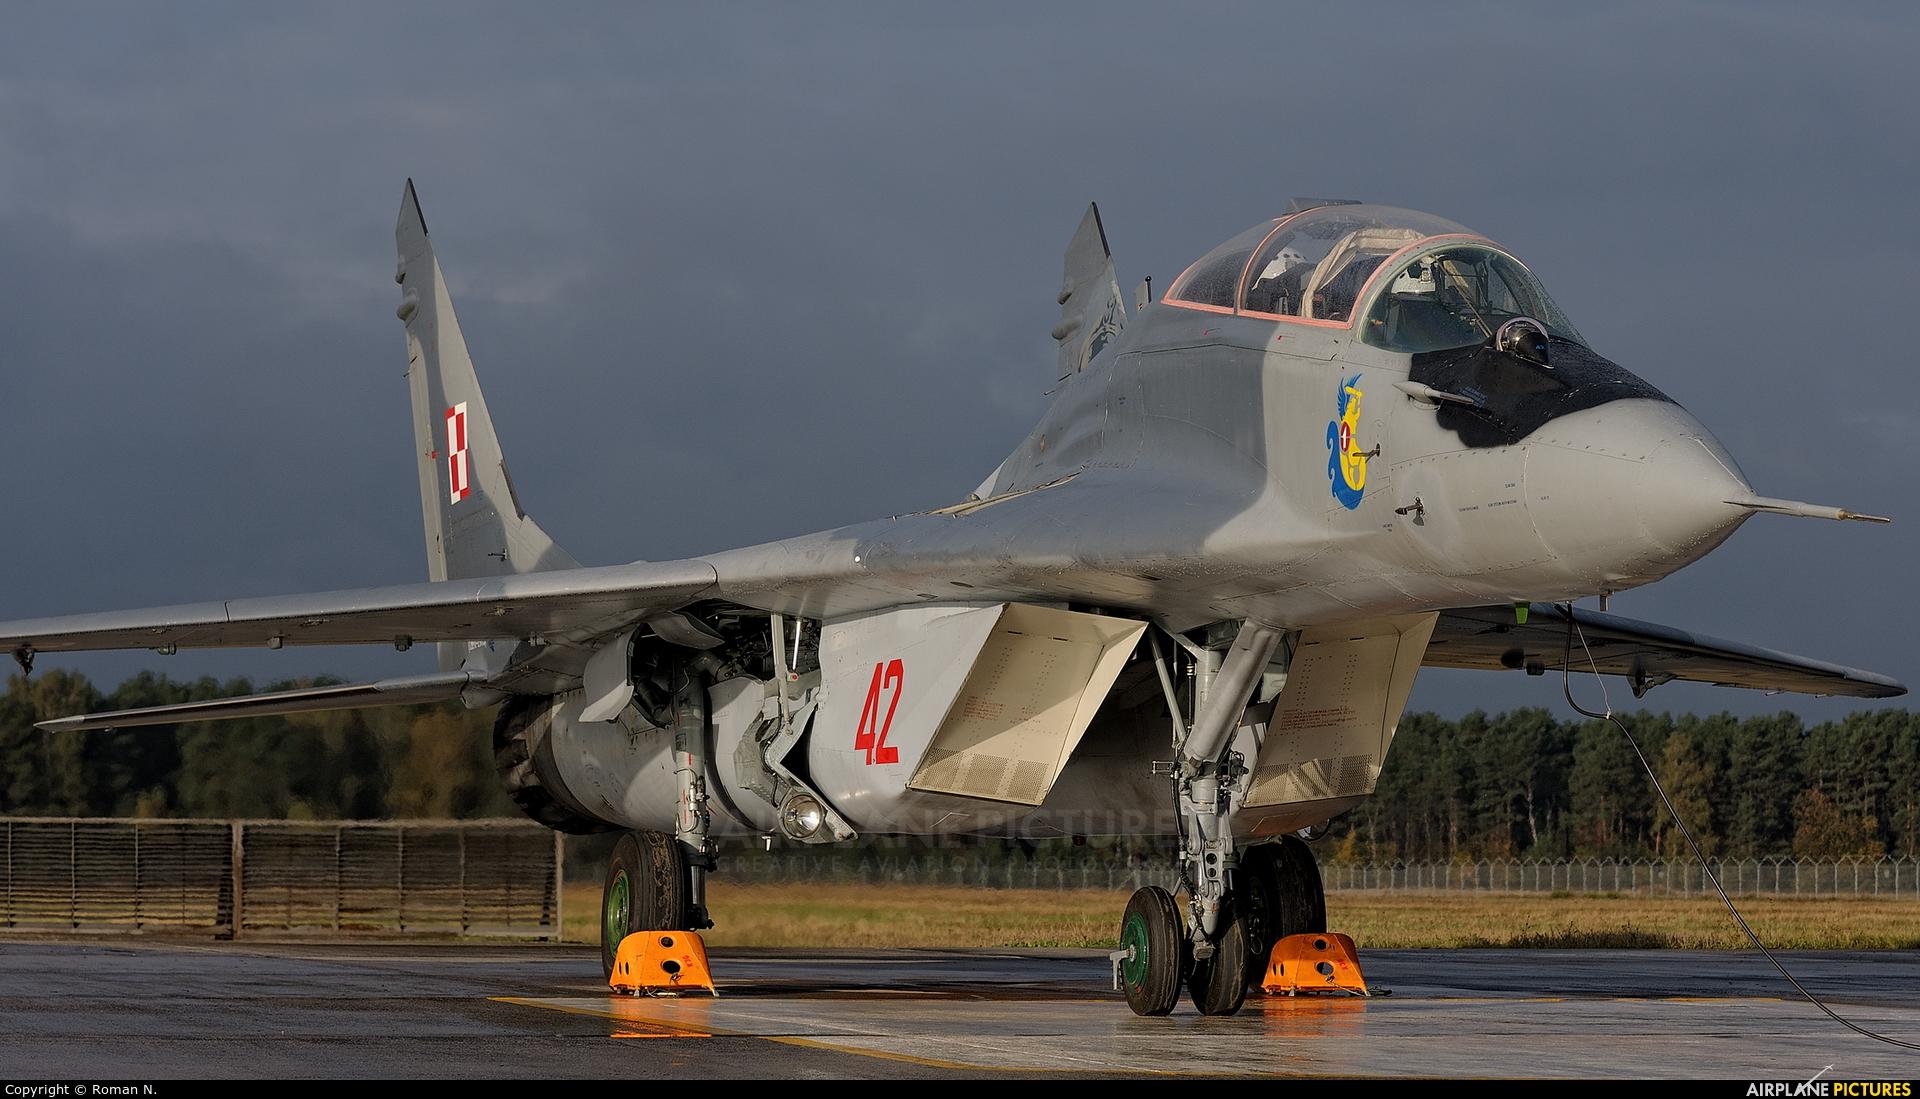 Poland - Air Force 42 aircraft at Bydgoszcz - Szwederowo